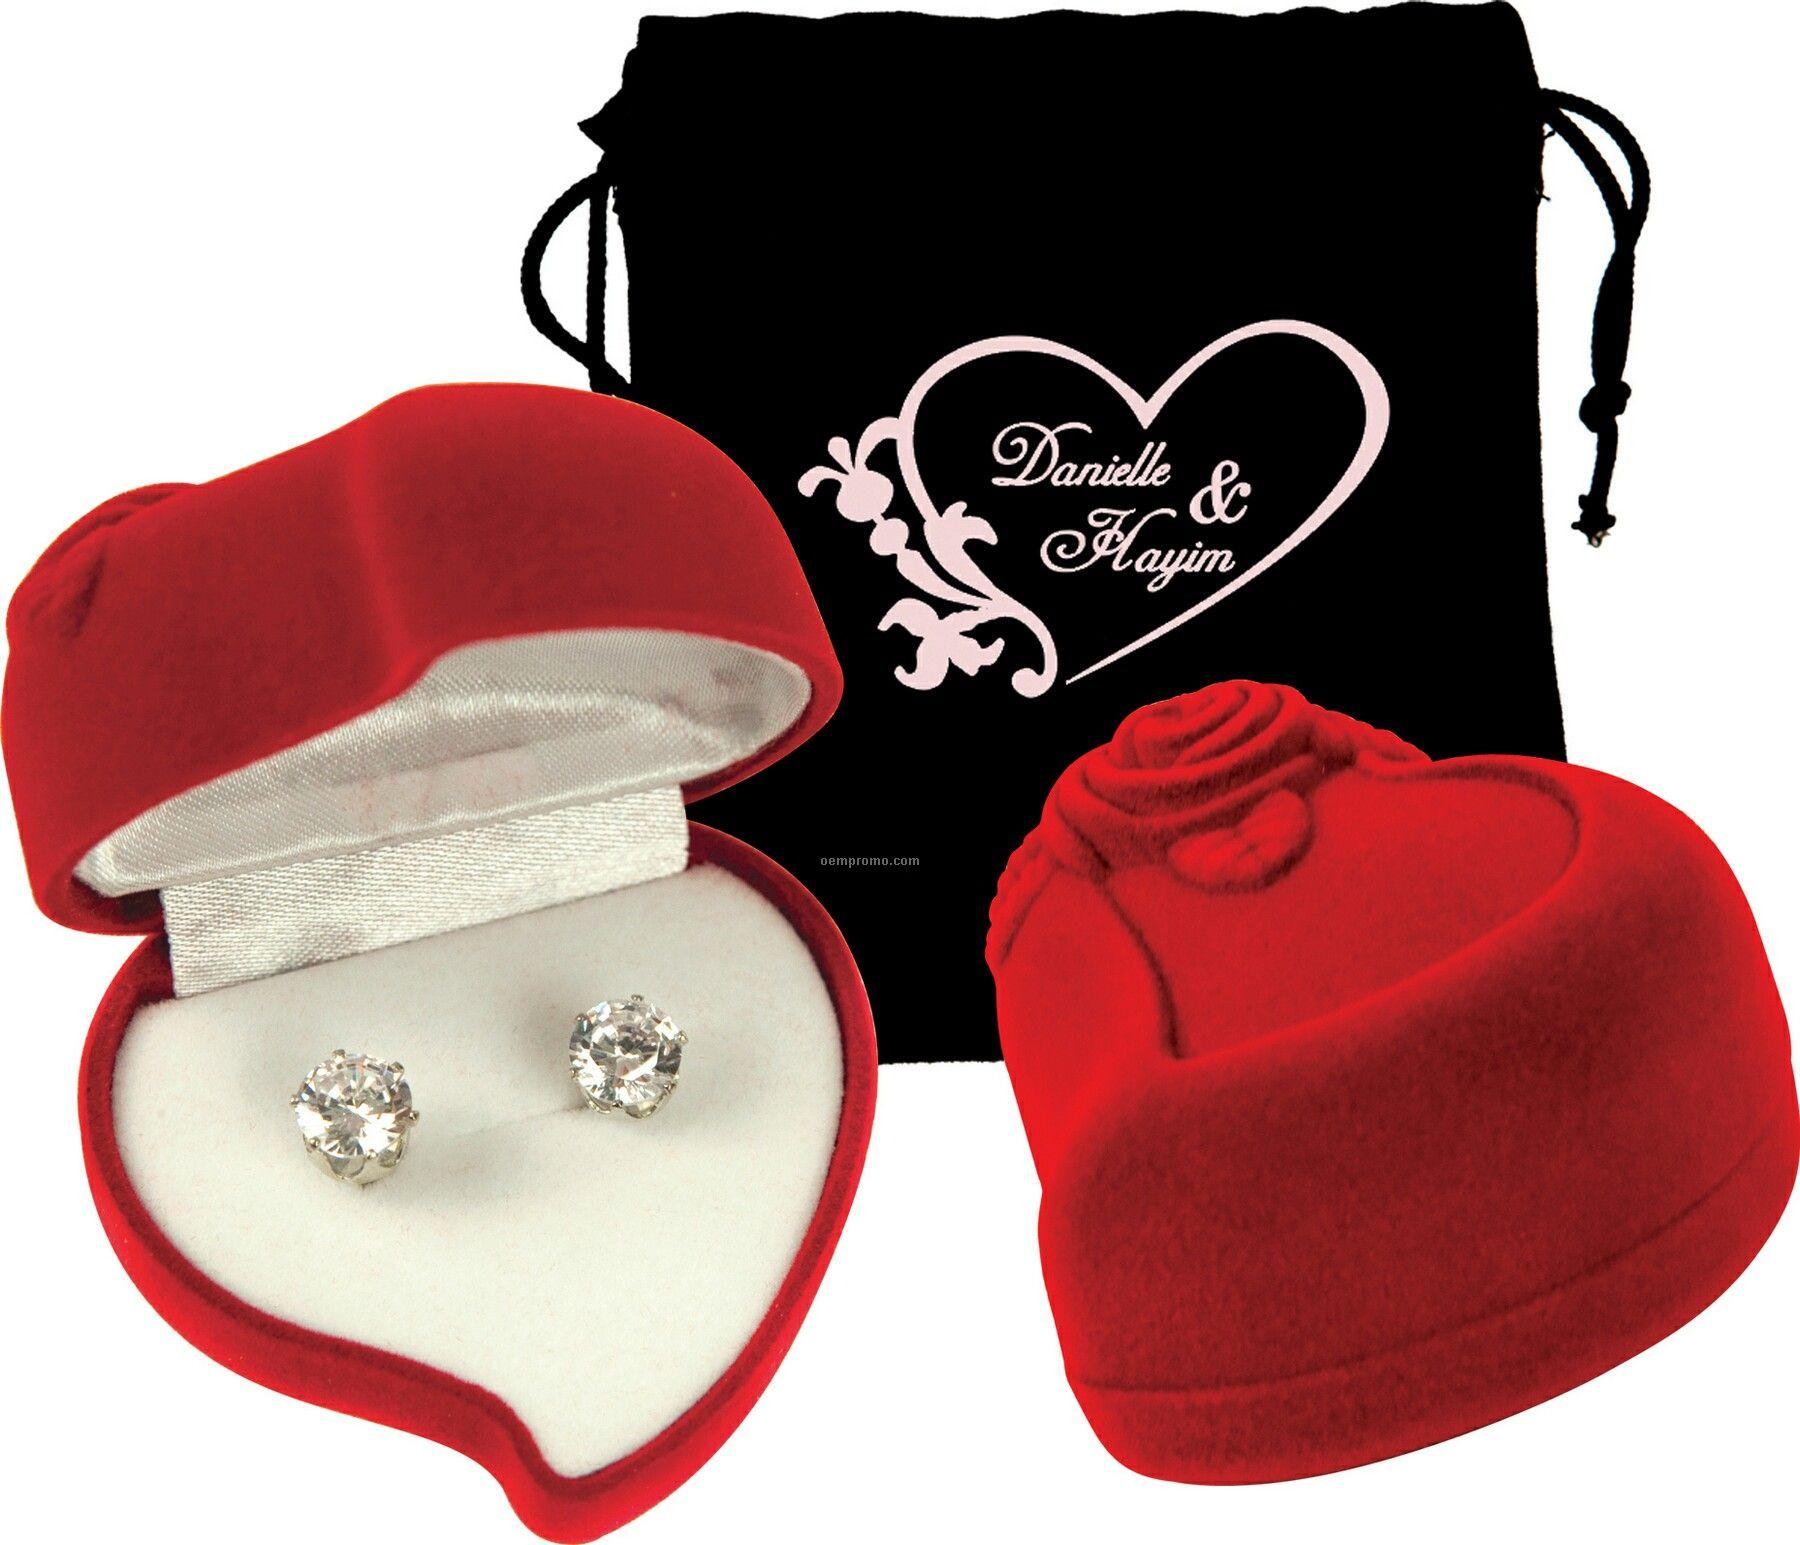 Cubic Zirconia Earrings With Heart Case